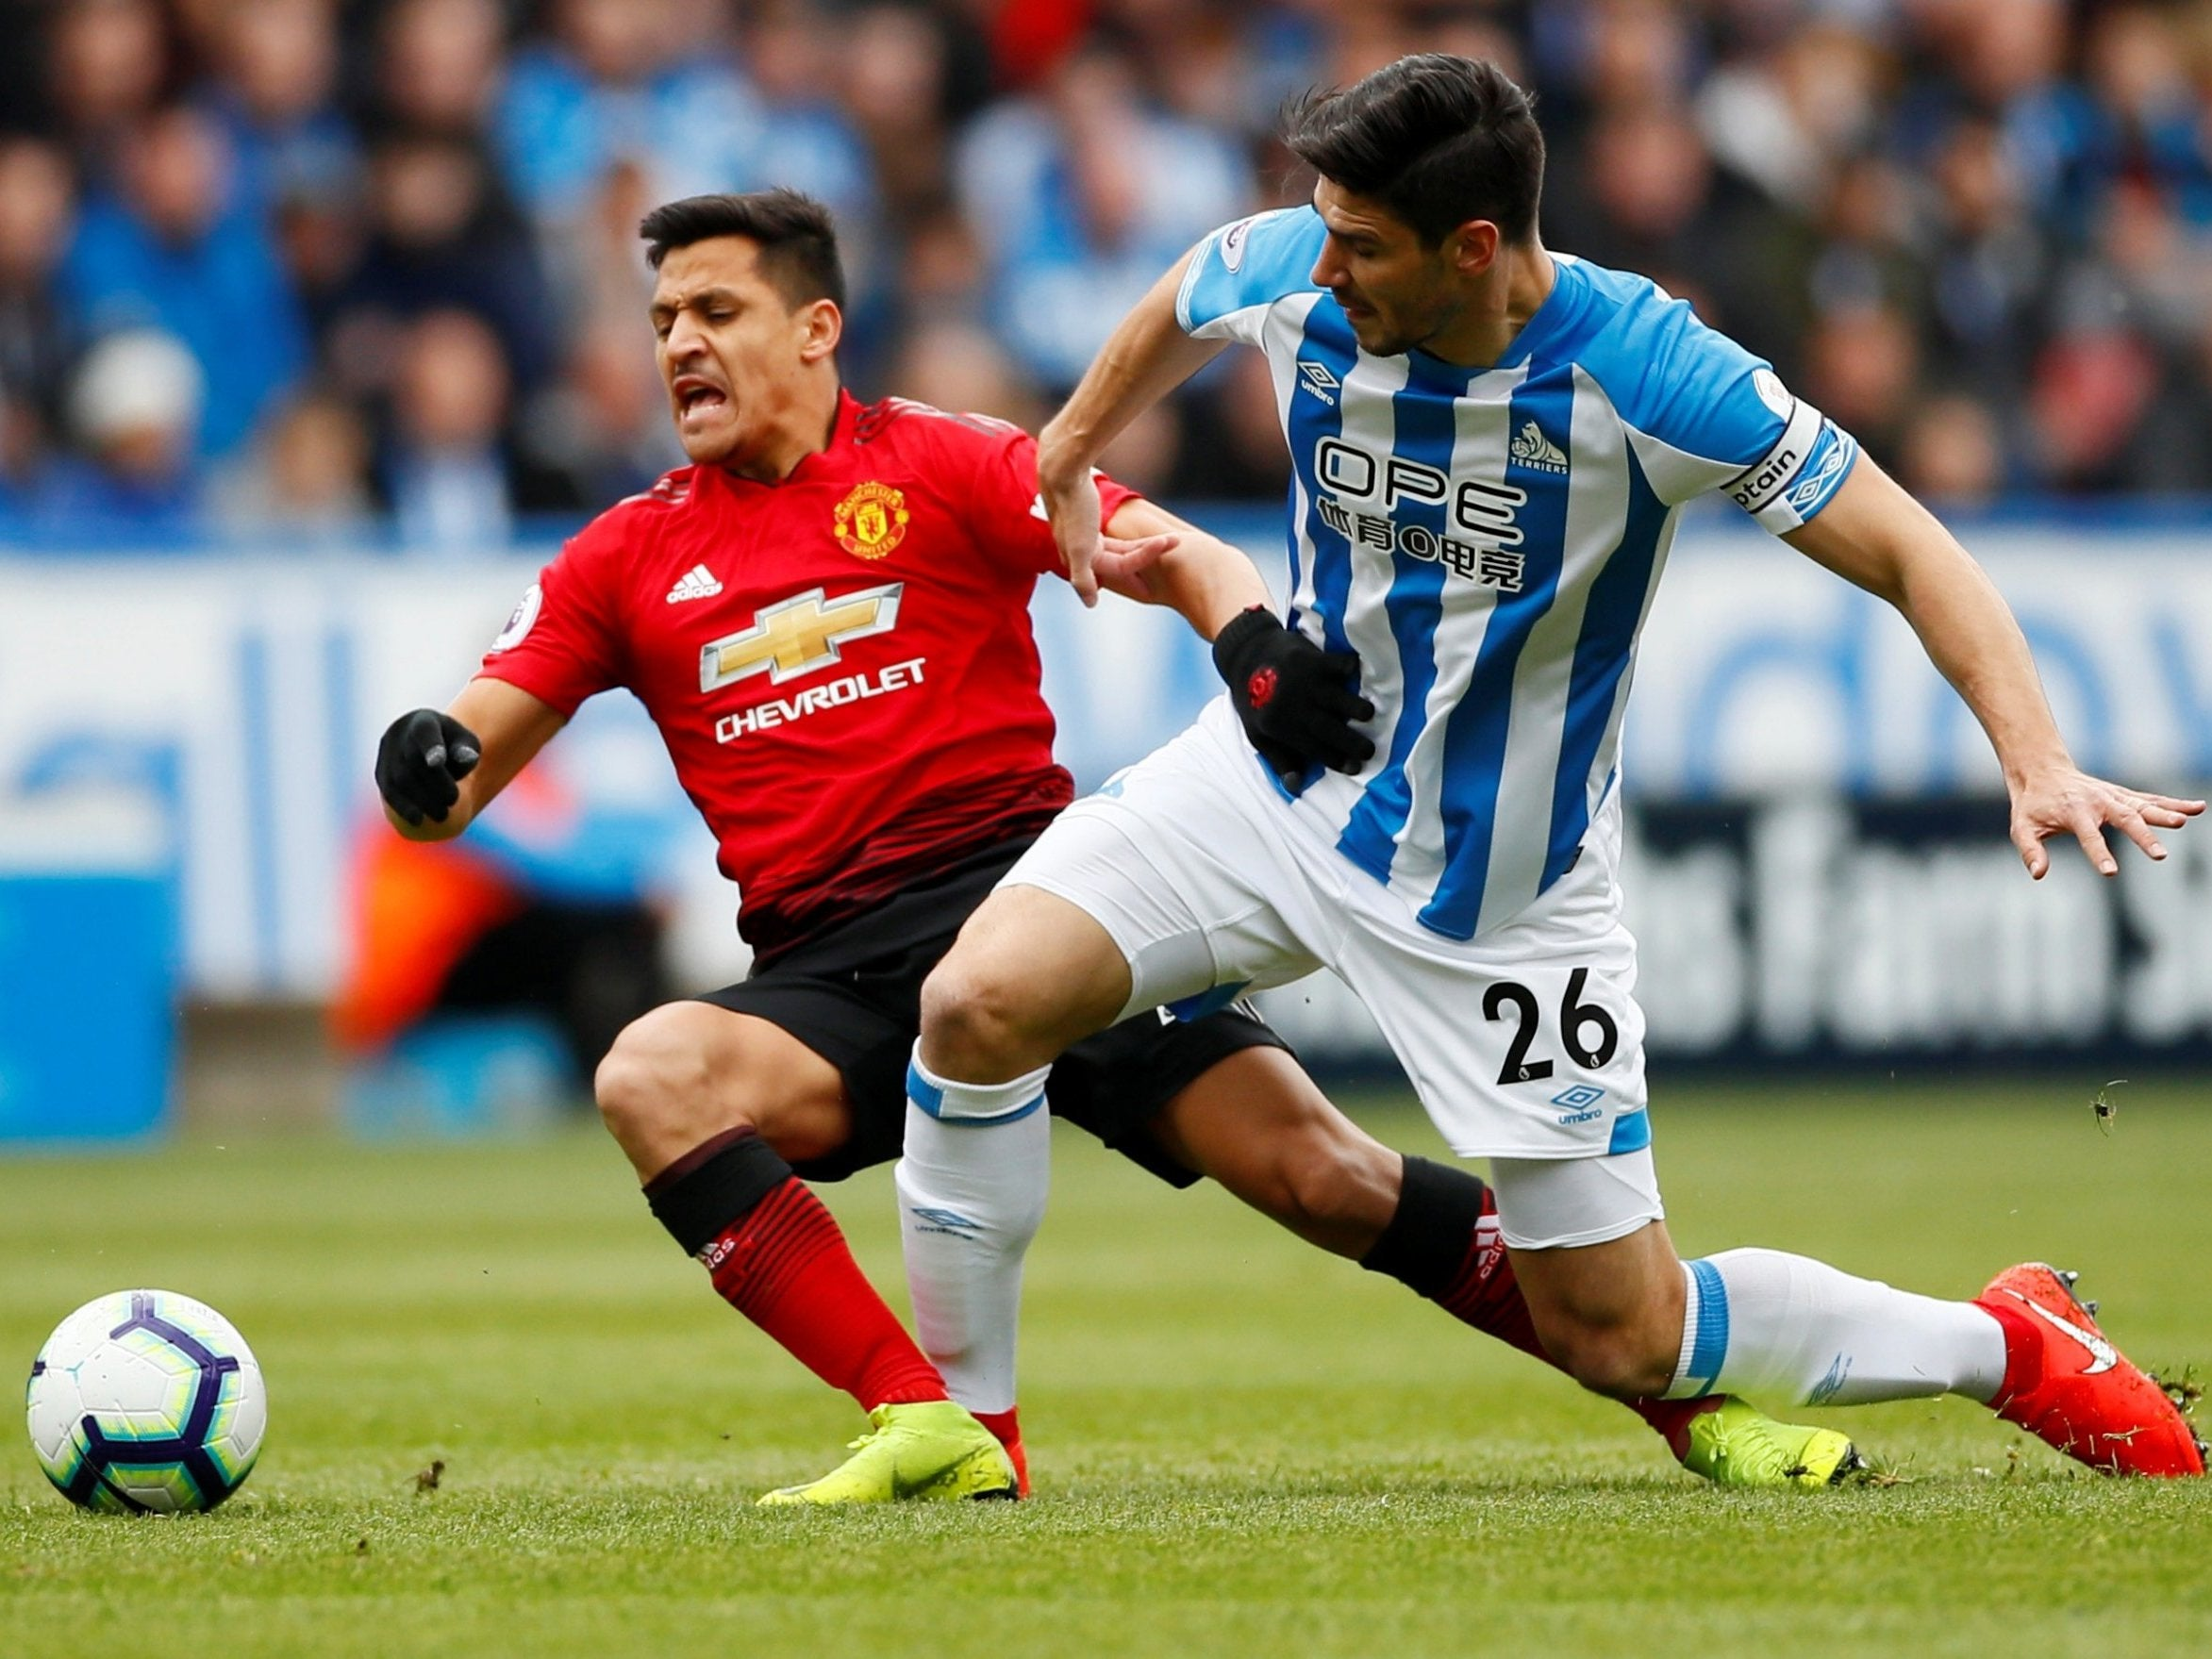 Resultado de imagen de huddersfield 1 manchester united 1